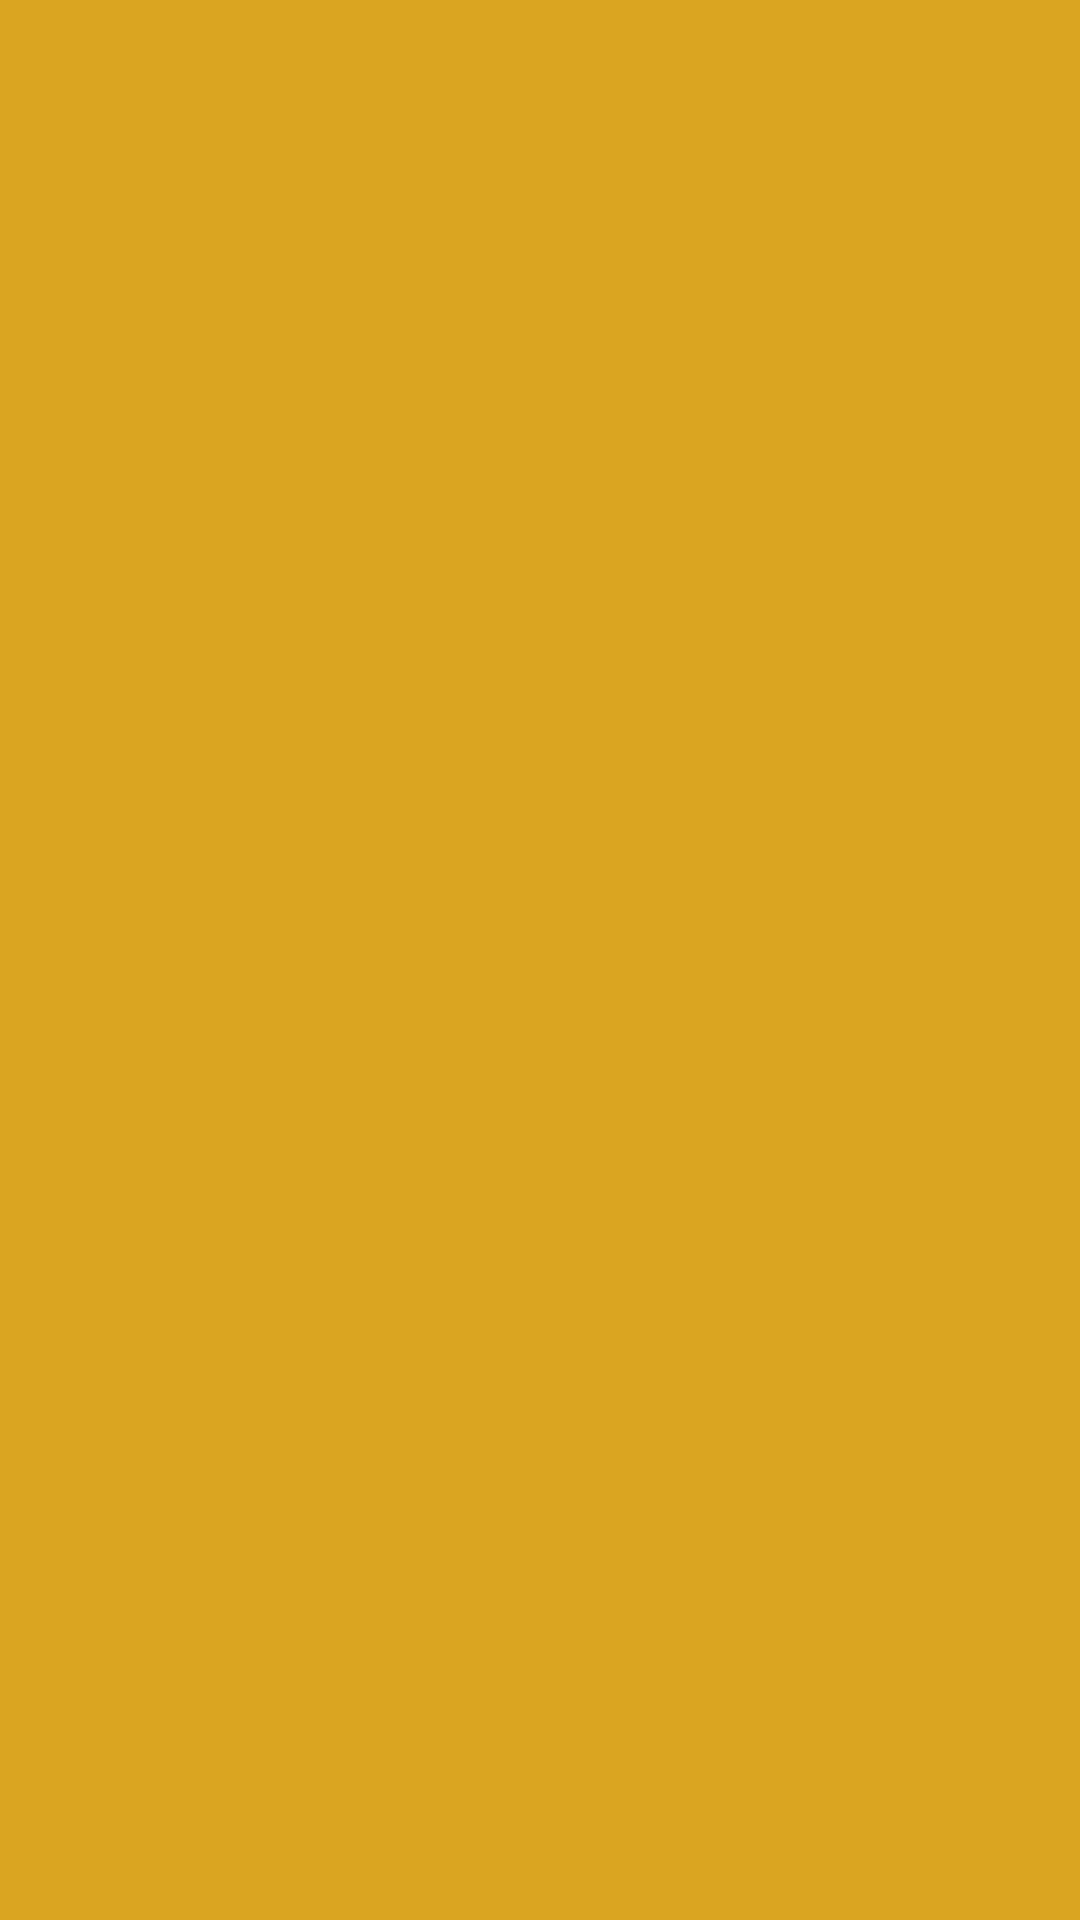 1080x1920 Goldenrod Solid Color Background